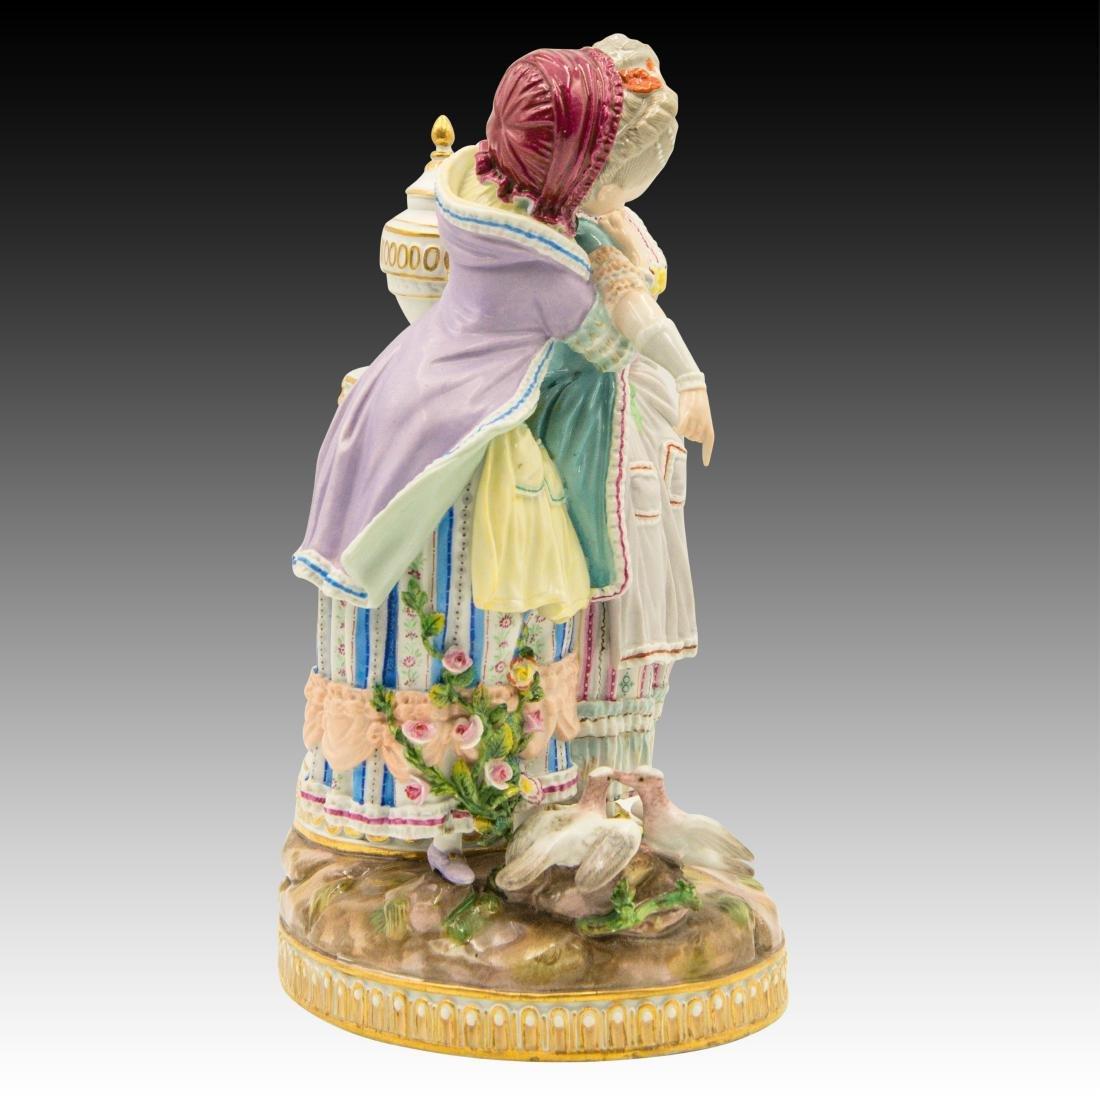 Meissen Figurine with 2 Women with Birds and Urn - 2